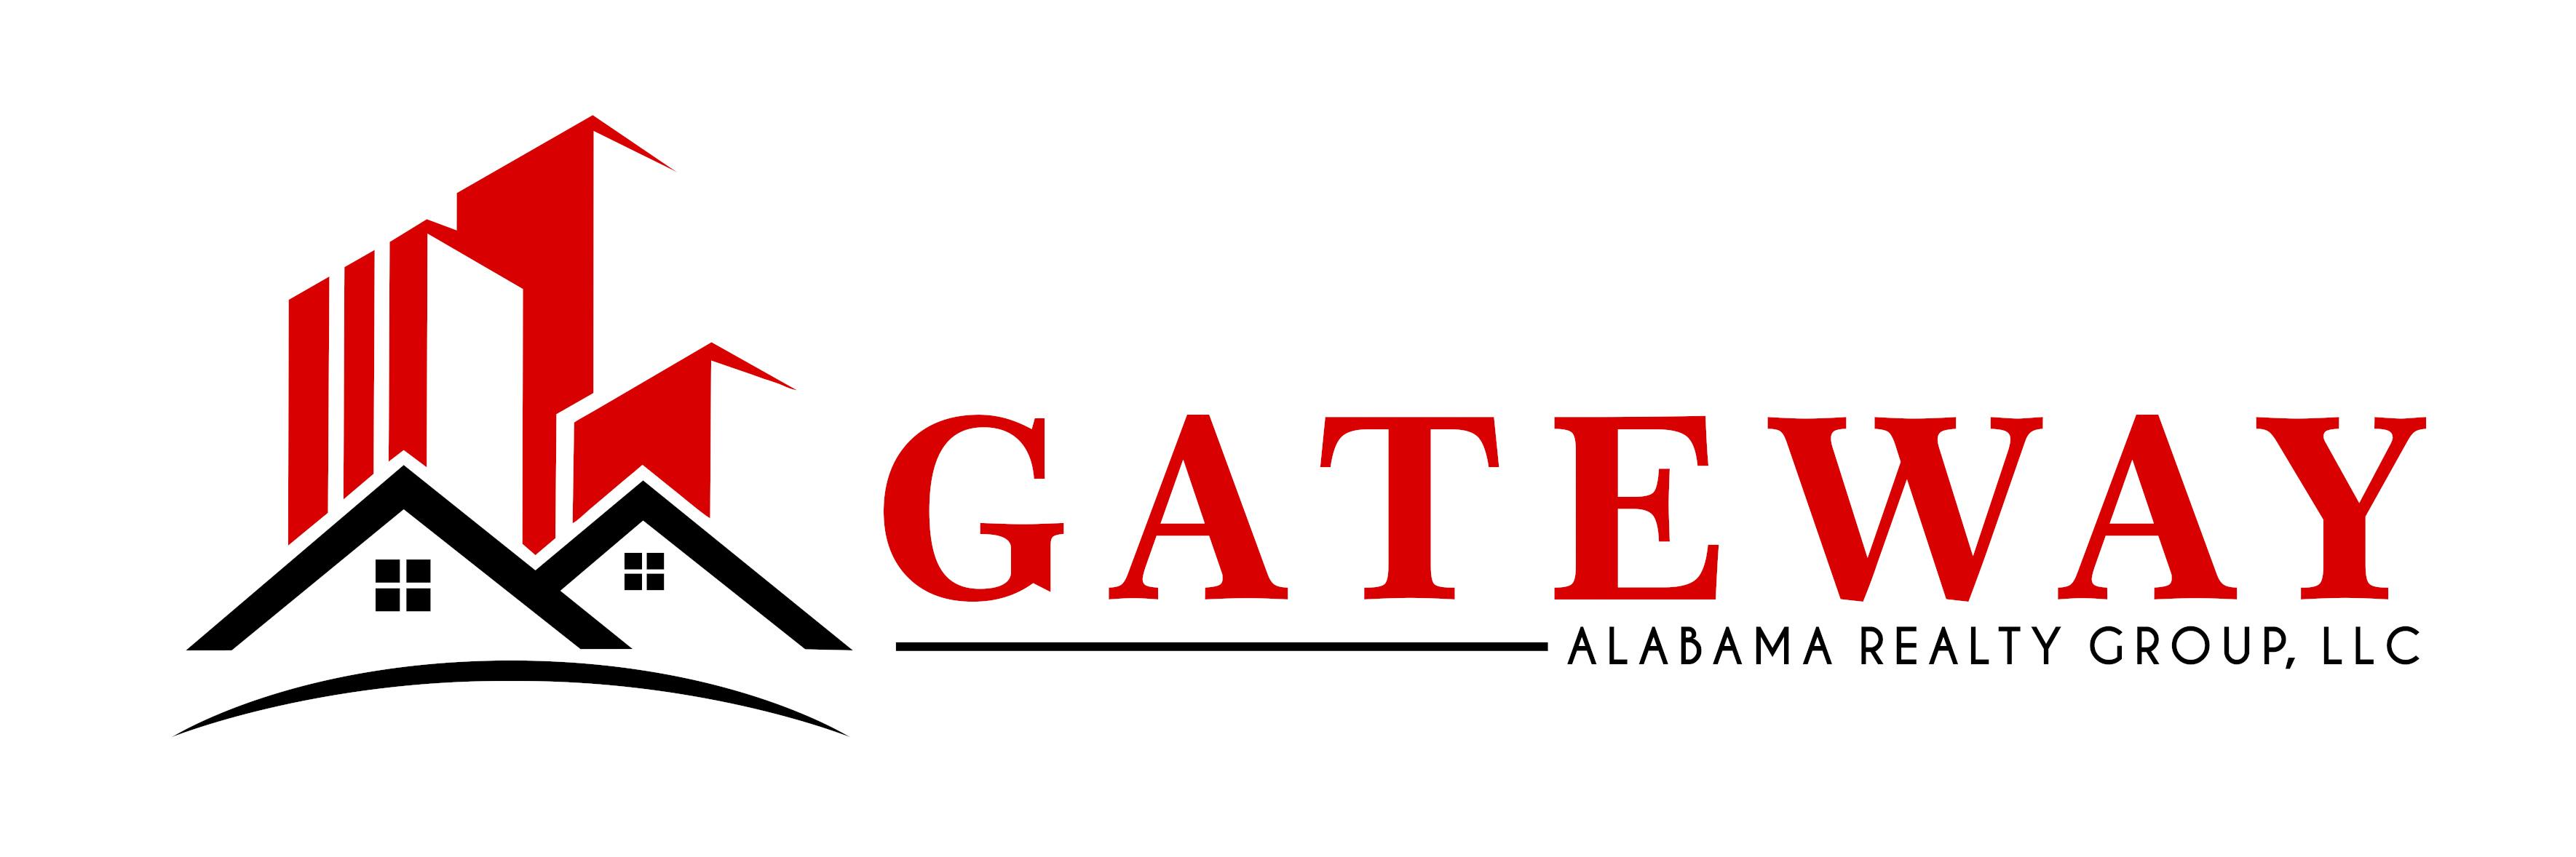 Gateway Alabama Realty Group